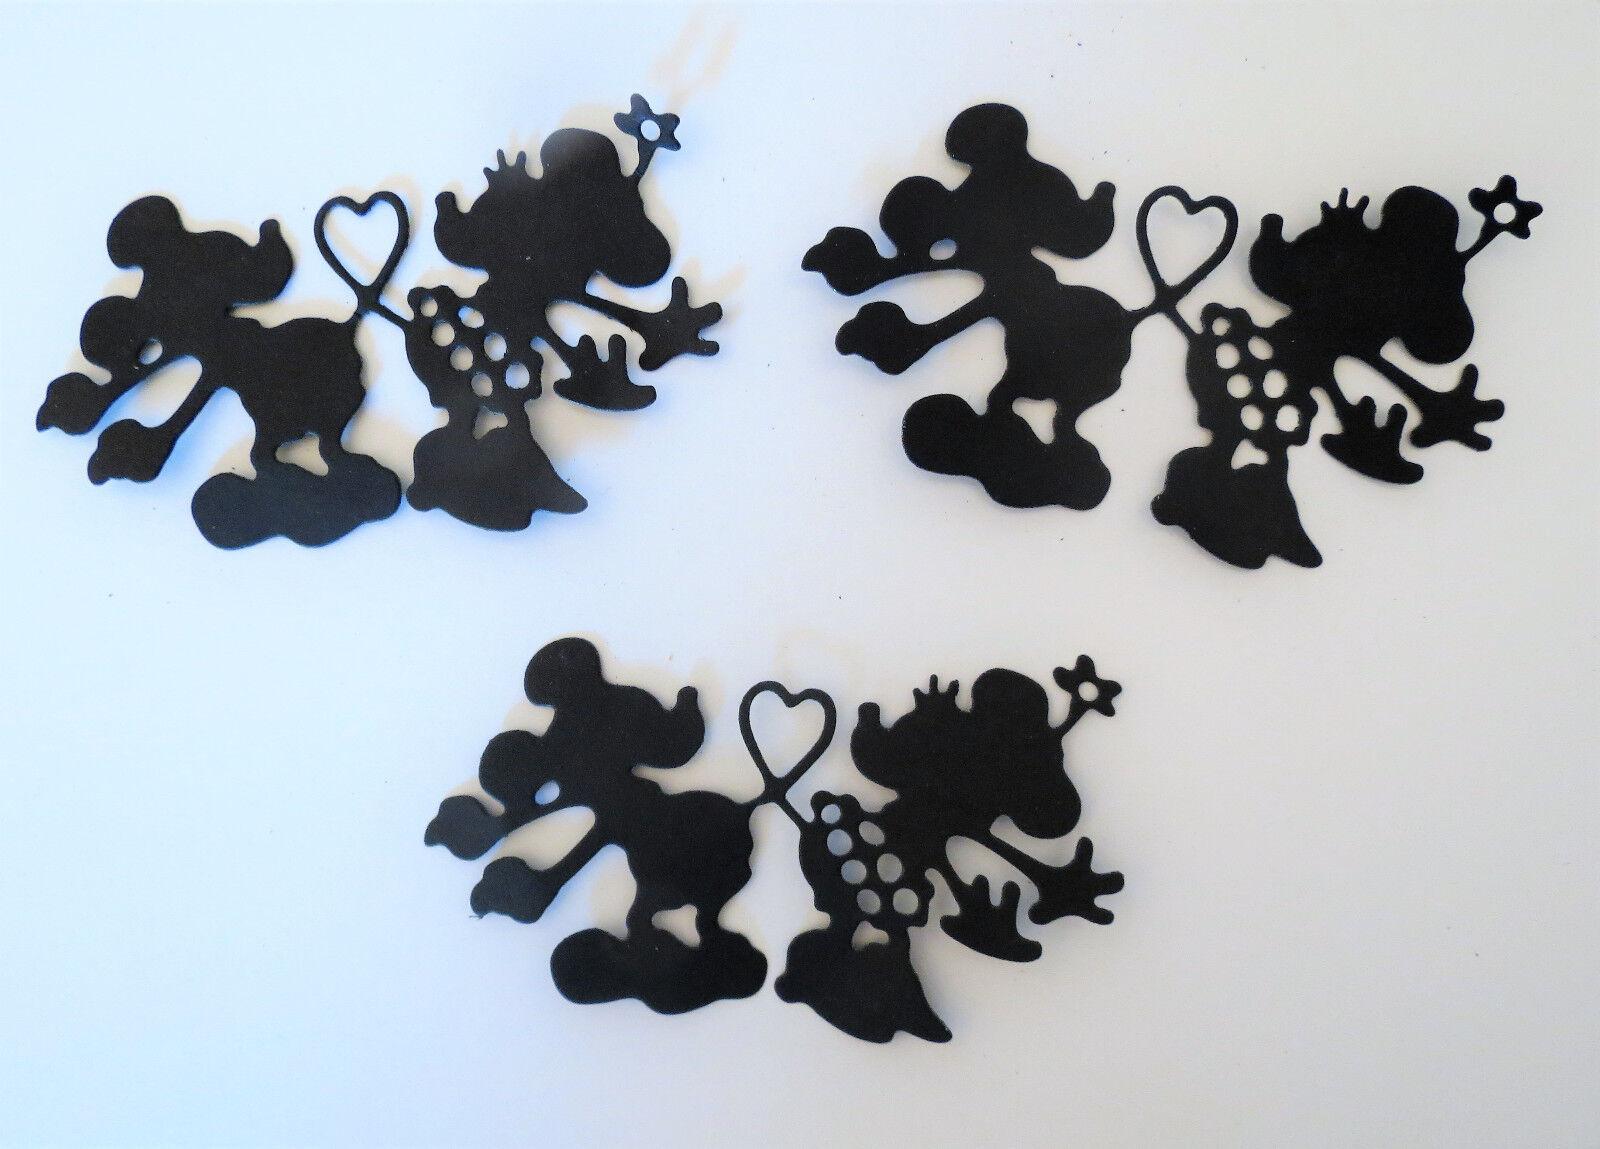 Mickey Minnie Silhouette Paper Die Cut Embellishments scrapbooking 3 pc Black